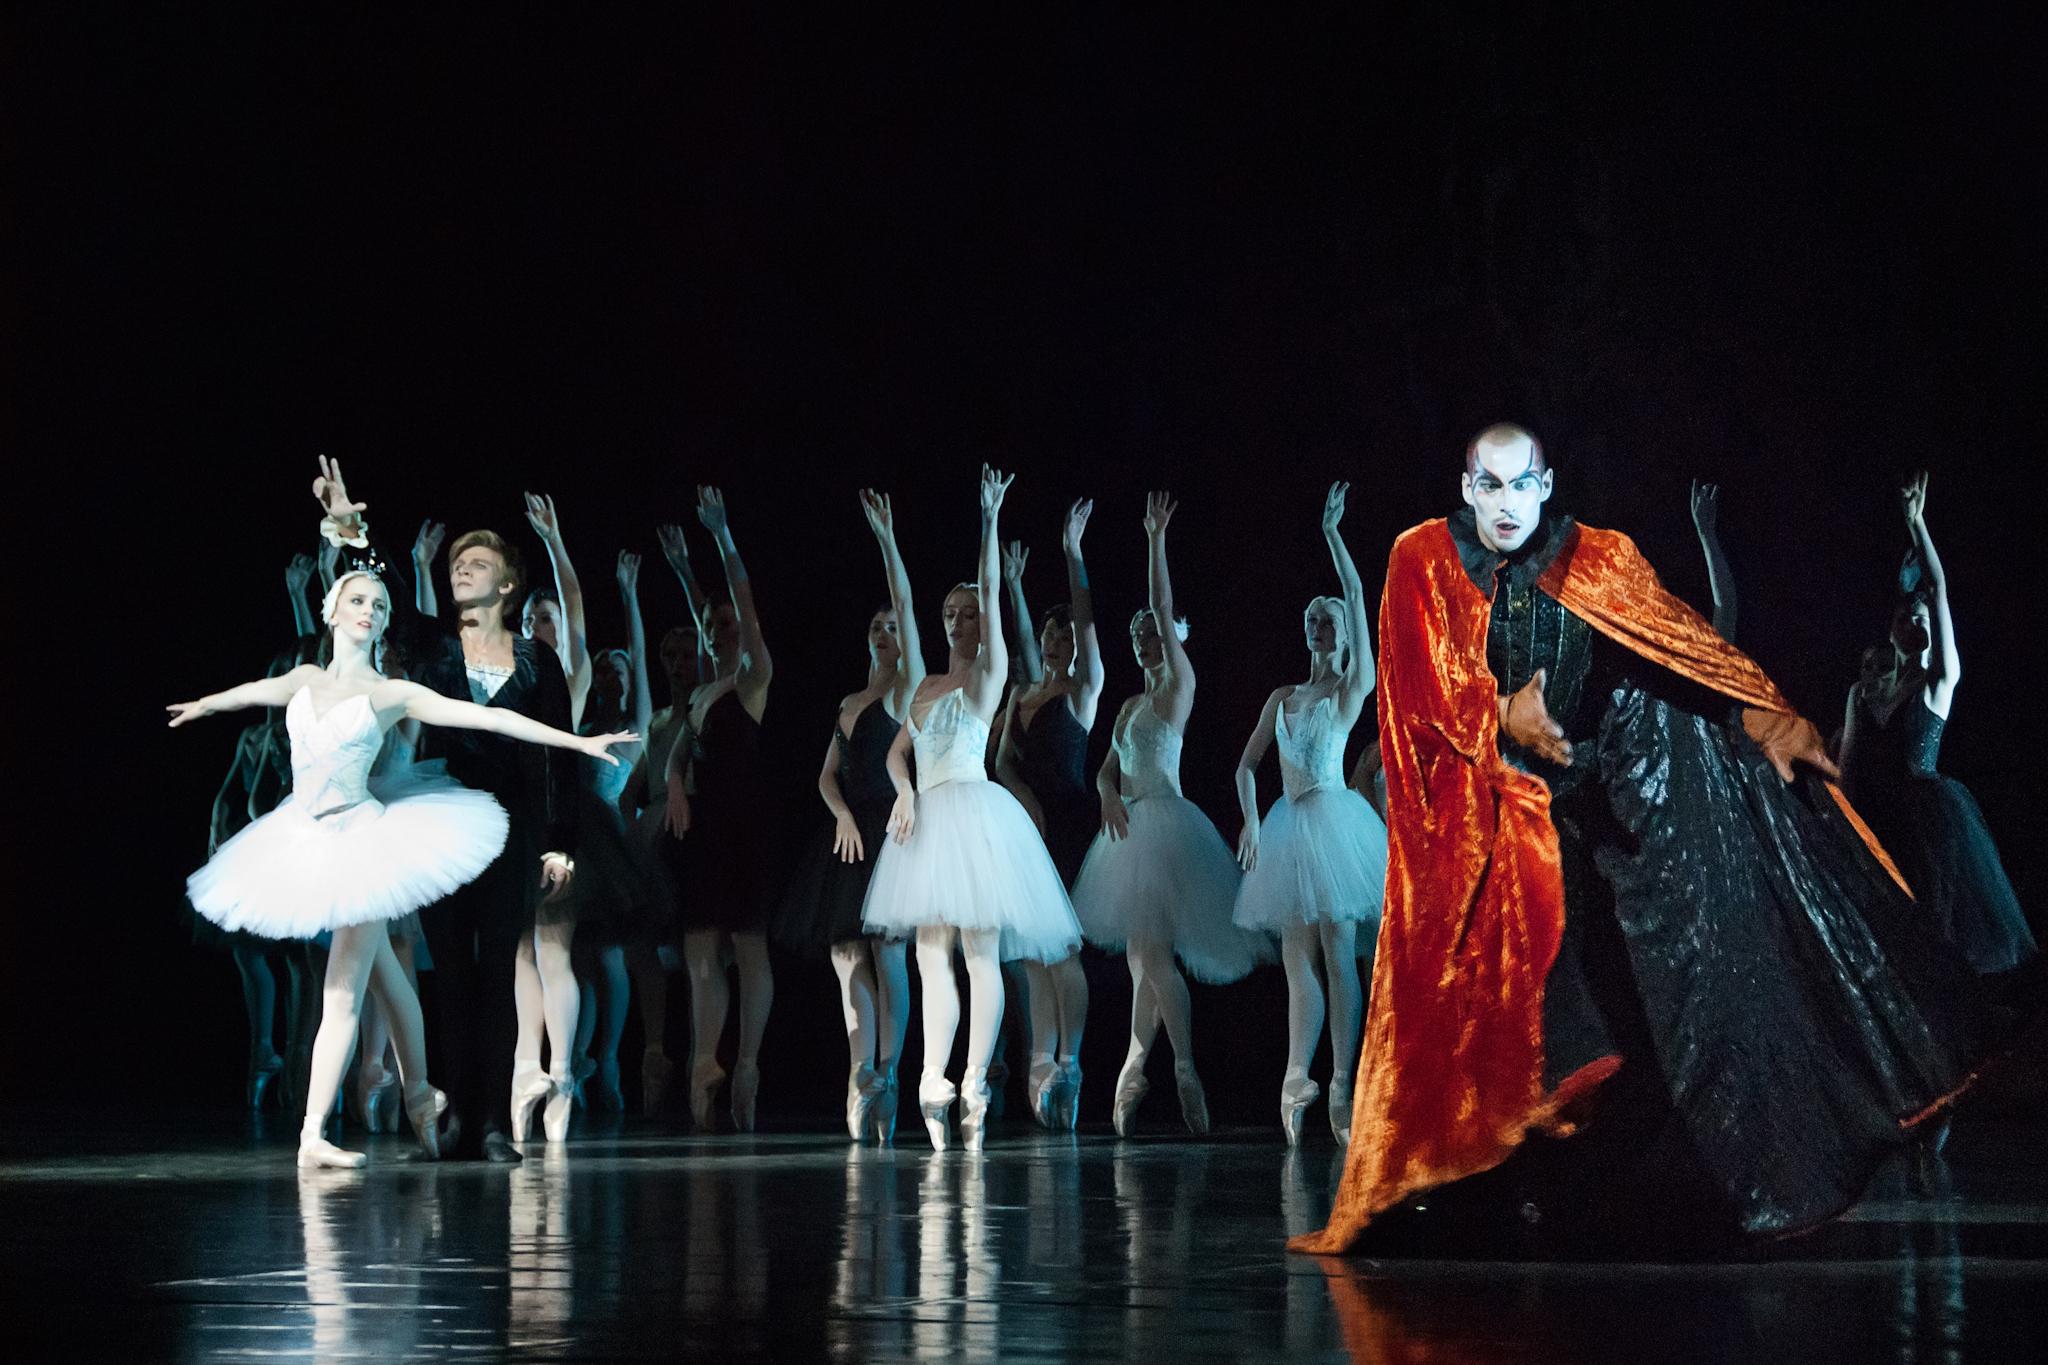 Royal Danish Ballet: Principals and Soloists